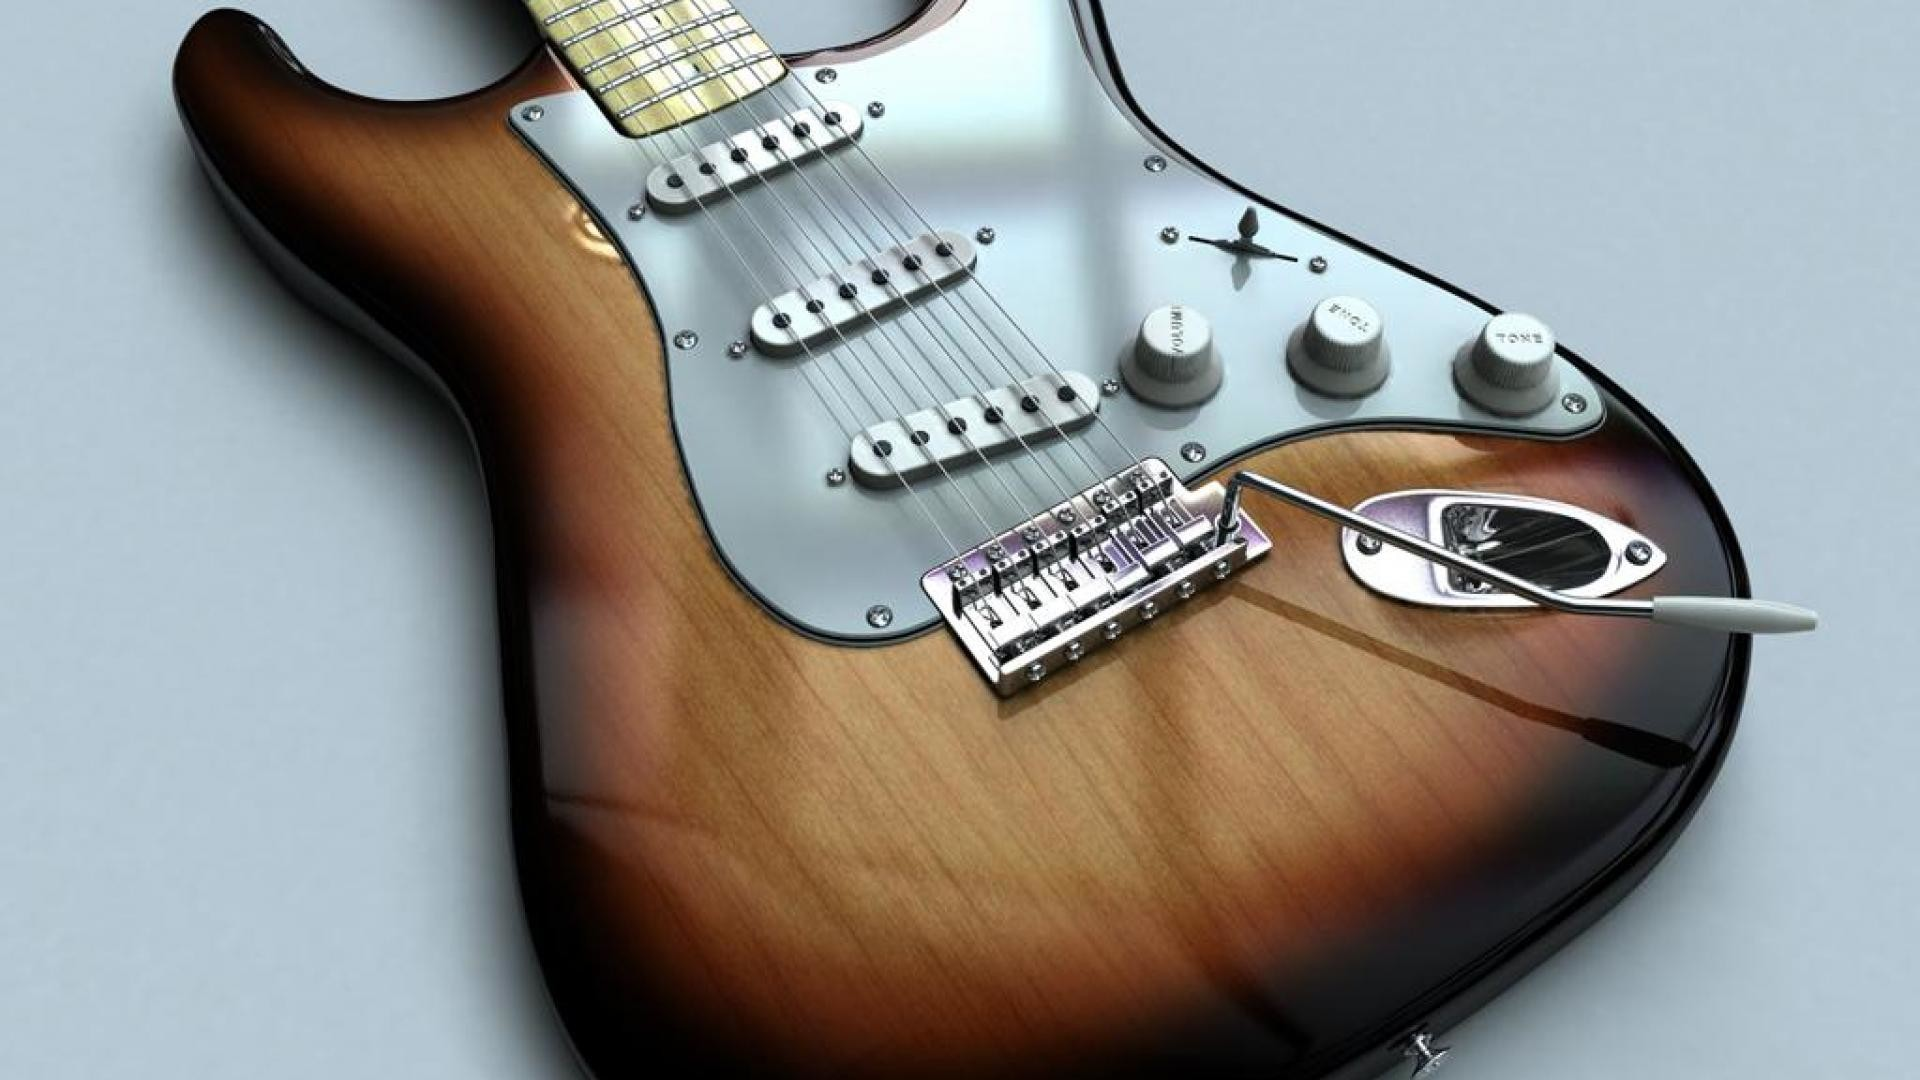 Fender Stratocaster Wallpaper HD – WallpaperSafari